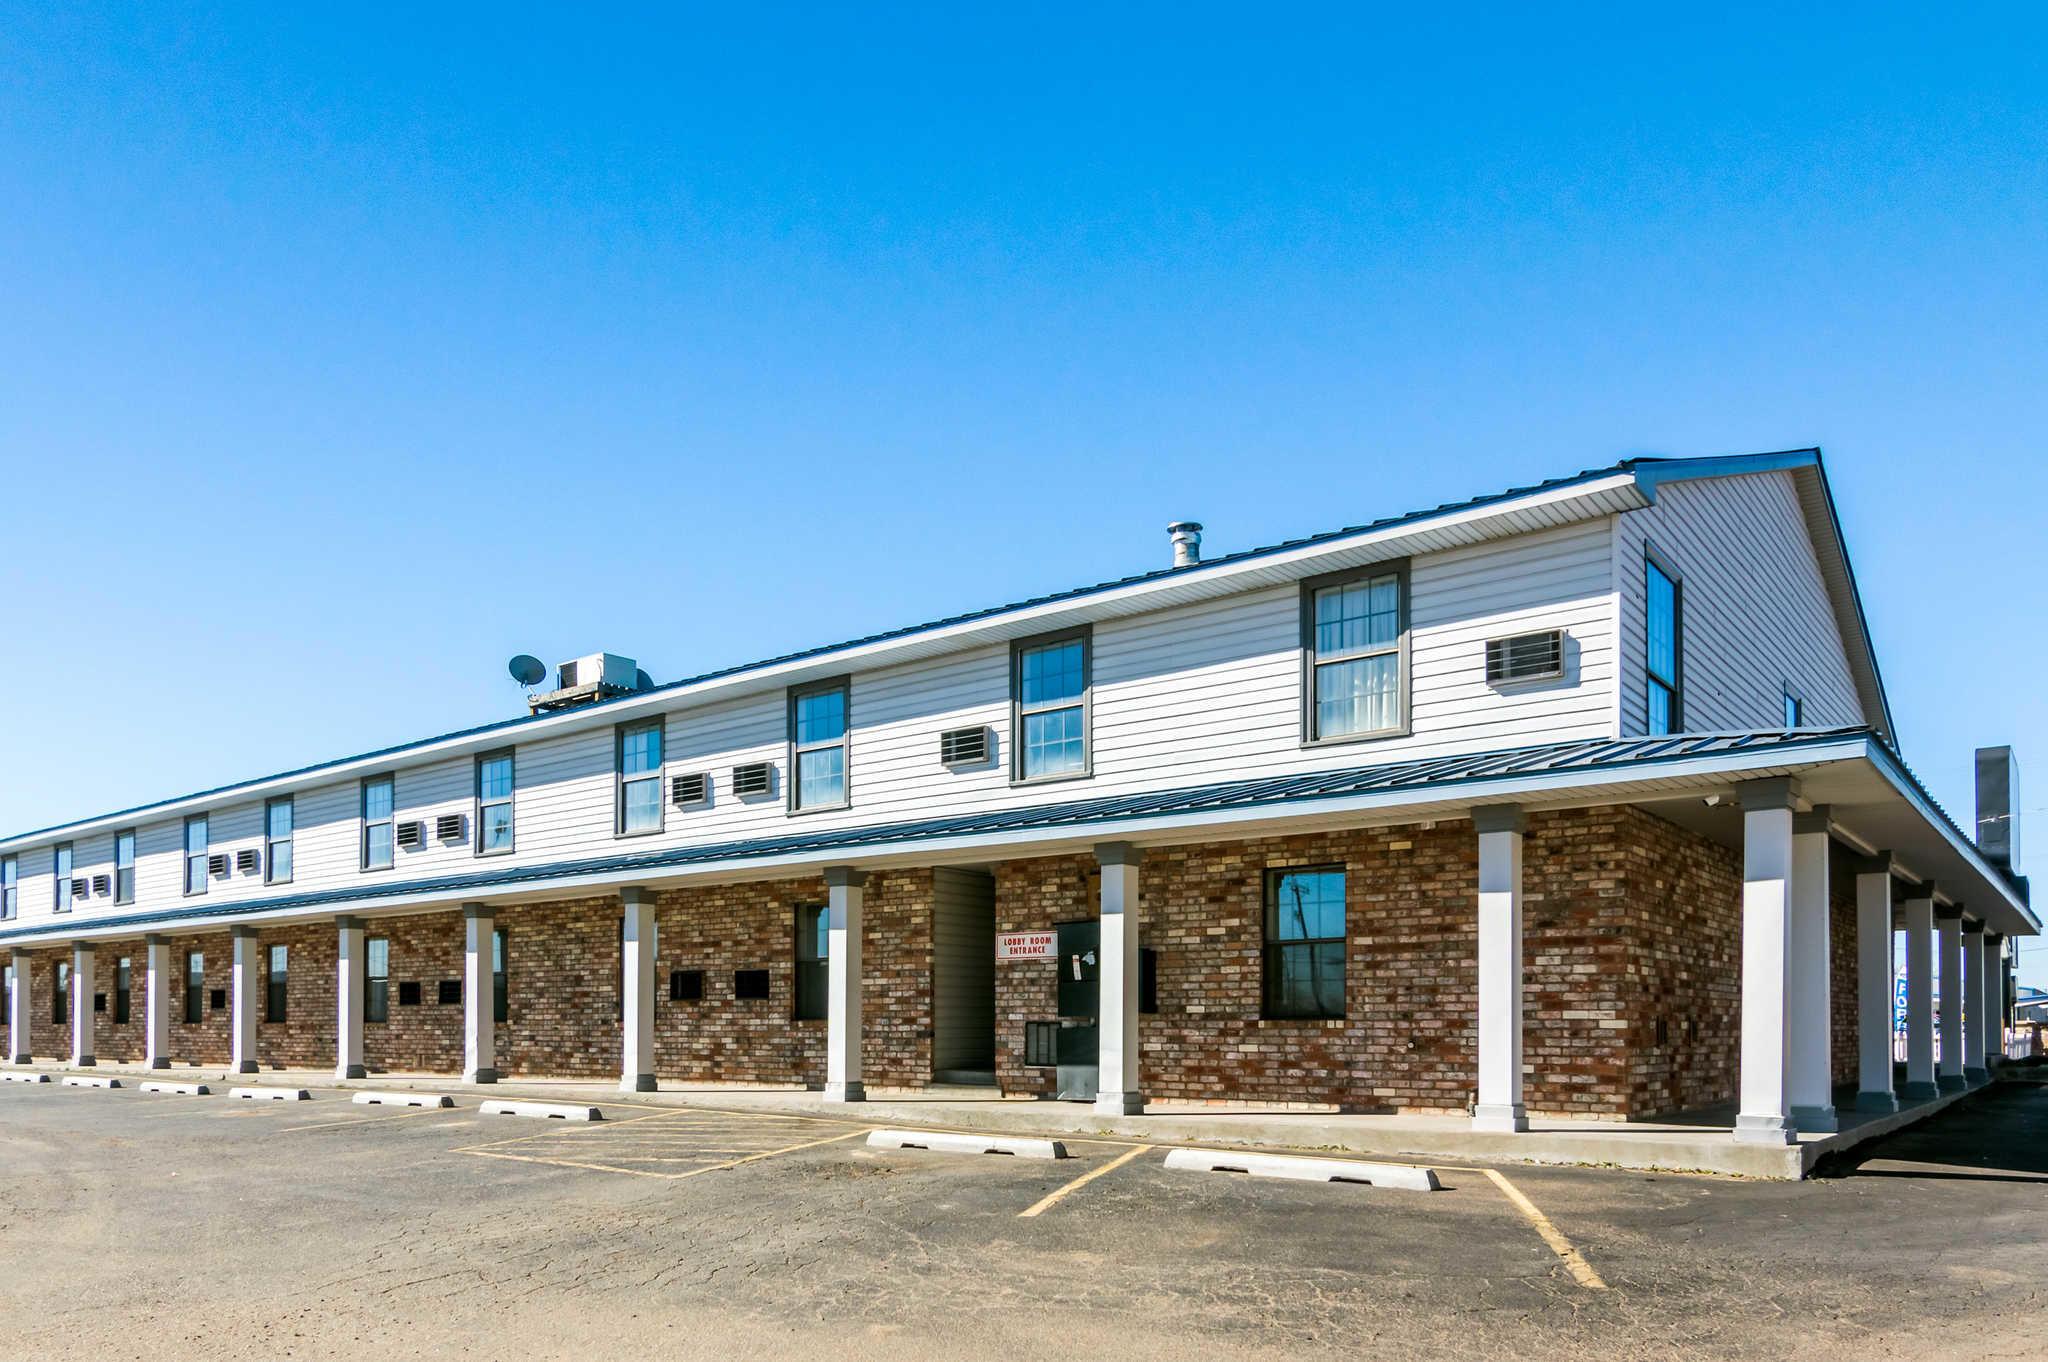 Econo Lodge image 29